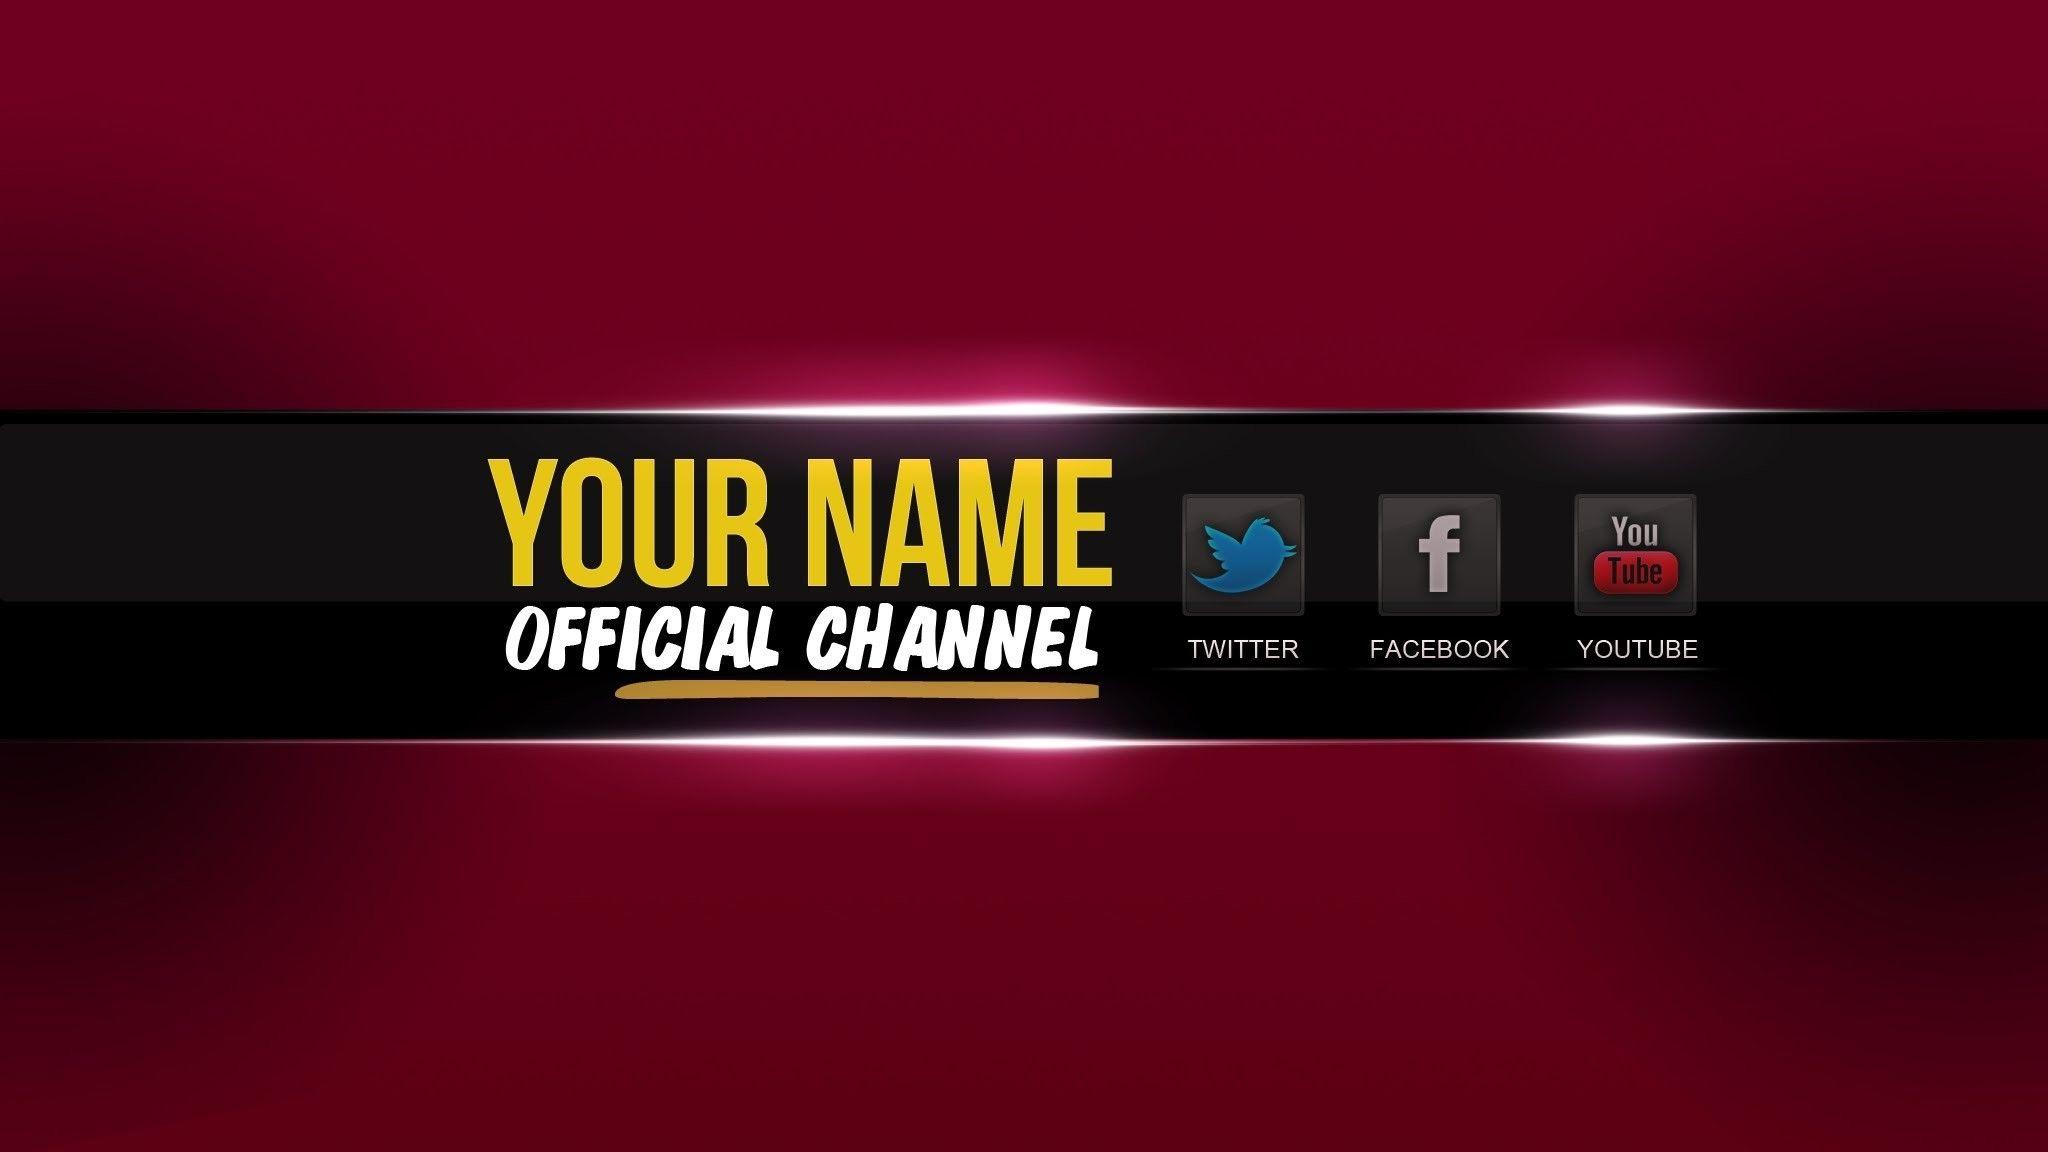 2048x1152 خلفيات قناة Youtube الفنية 89 صورة Youtube Banner Template Youtube Banner Backgrounds Youtube Channel Art